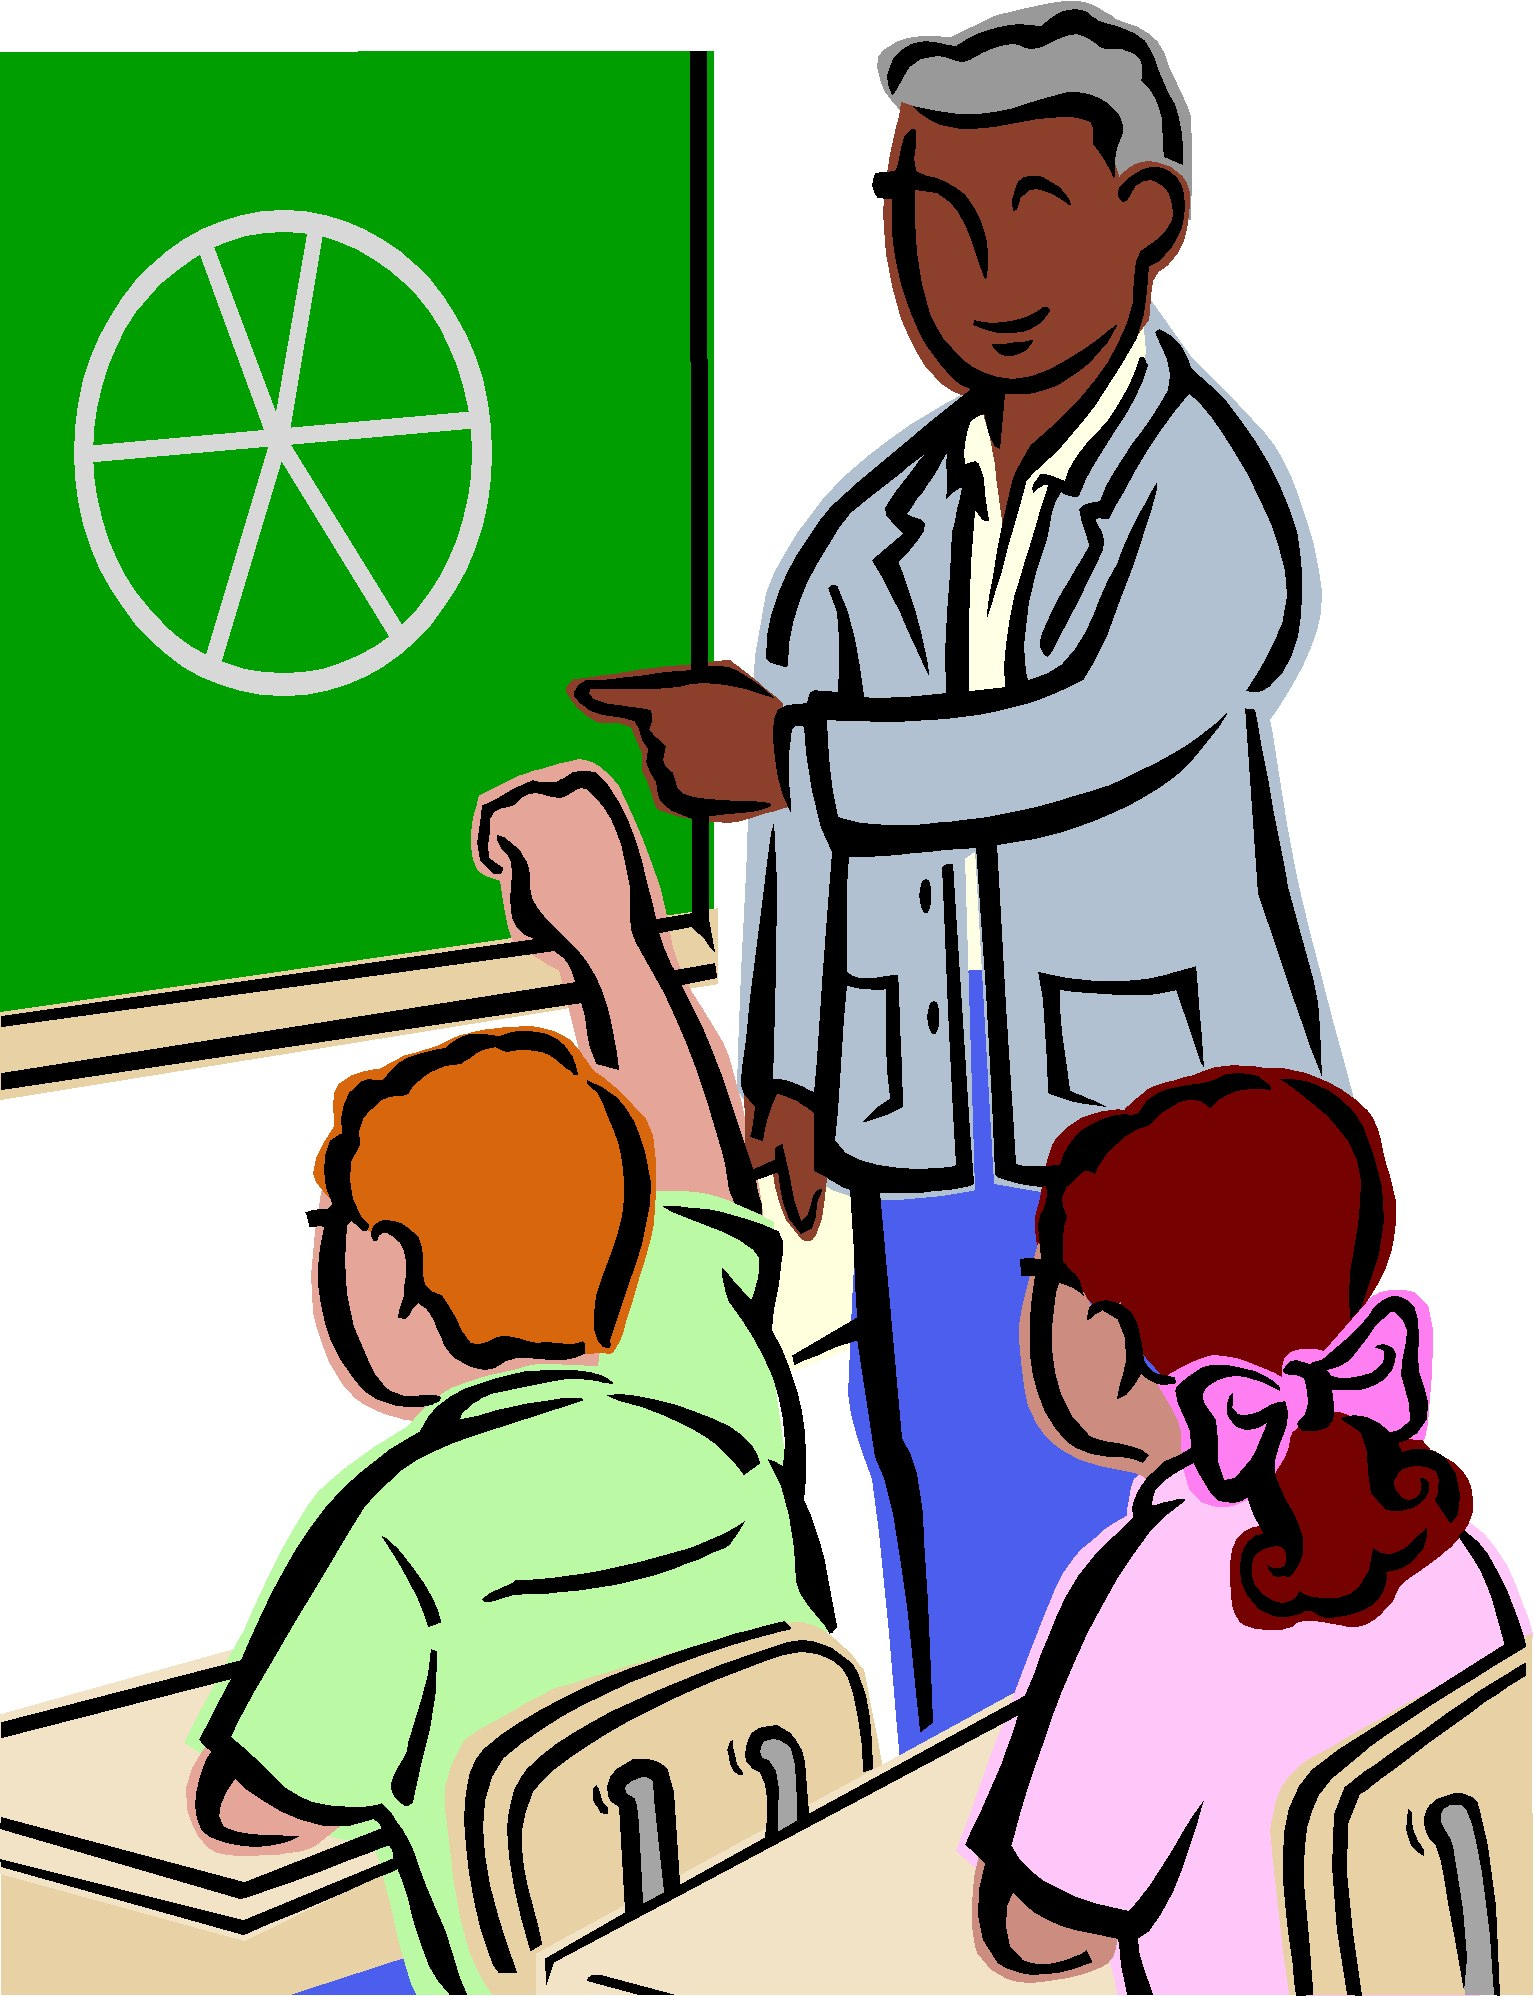 Classroom high school. Teacher reading to students